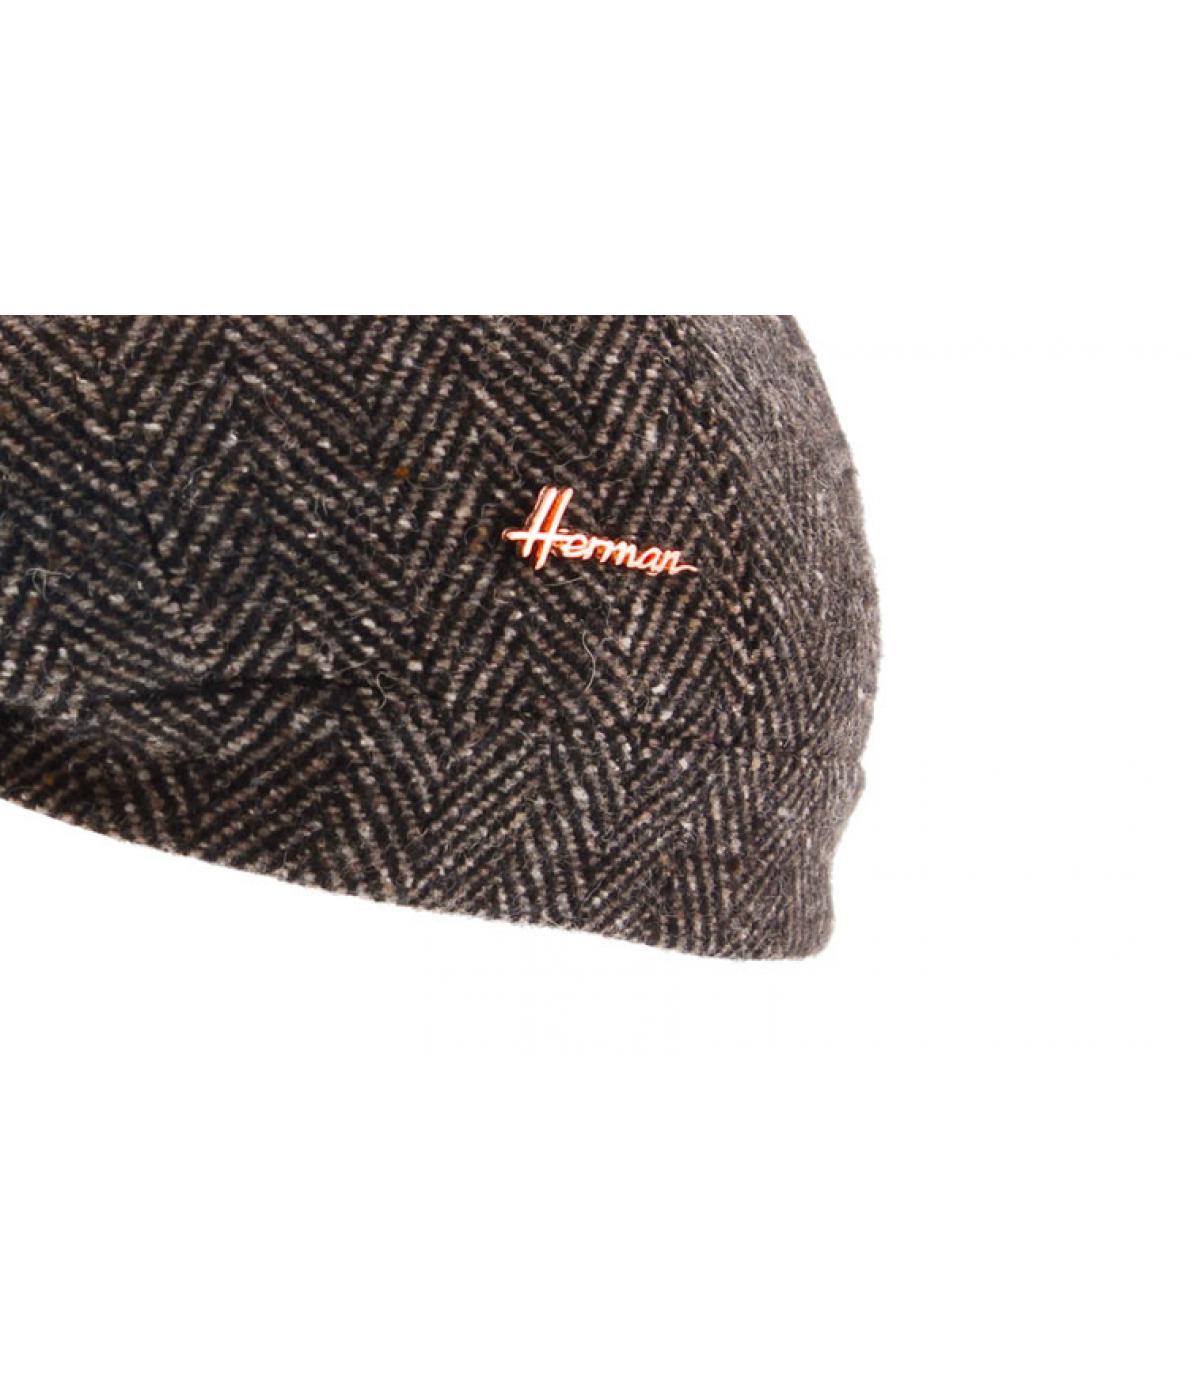 Dettagli Advancer Wool brown - image 3